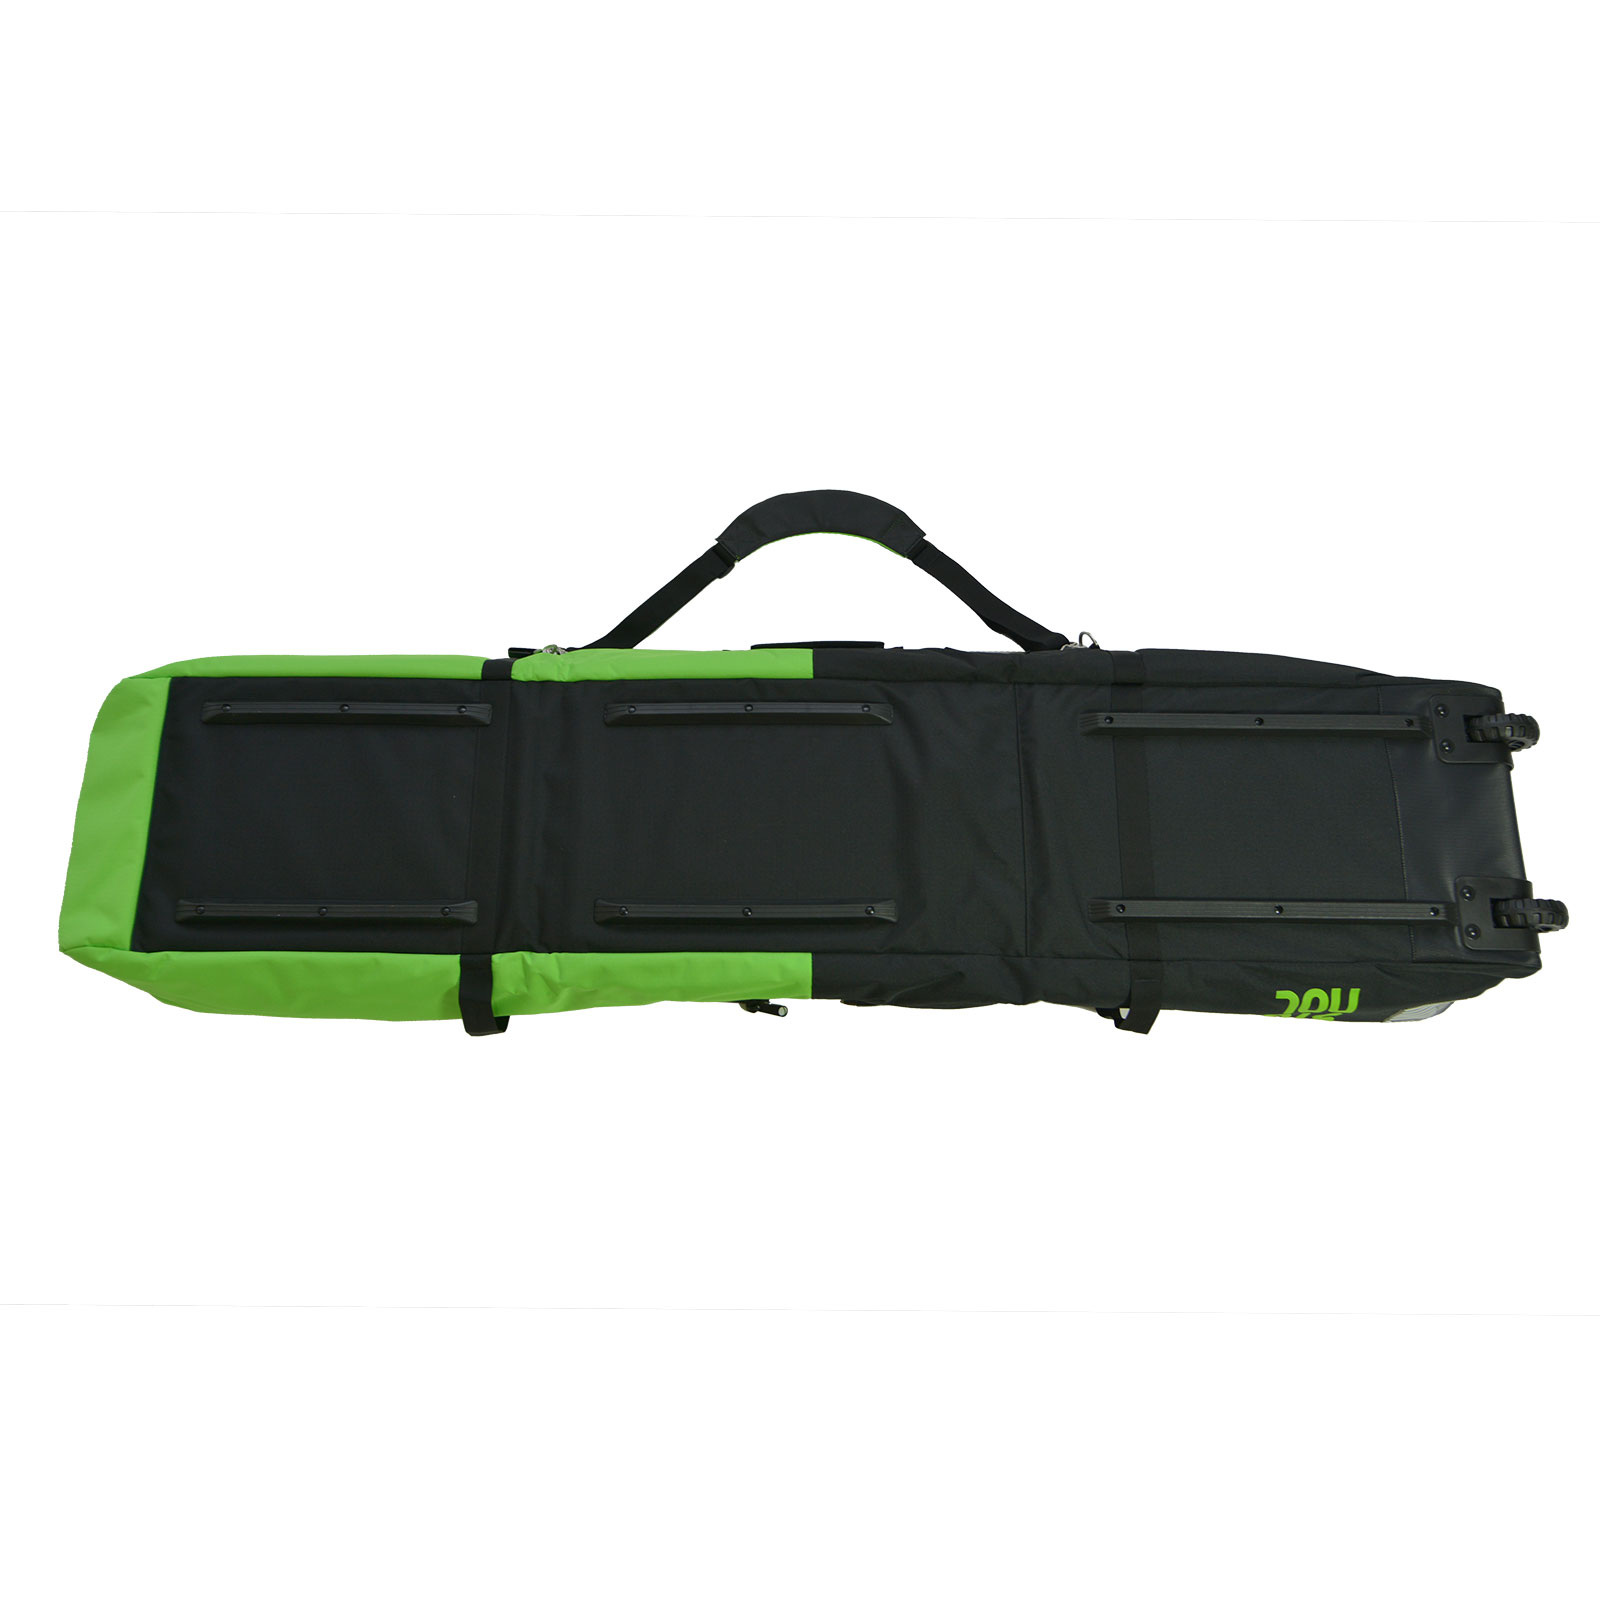 2220755d54 Rossignol Snow Split Roller B G Bag Snowboard Gear Travel Case Wheeled Case  - Walmart.com